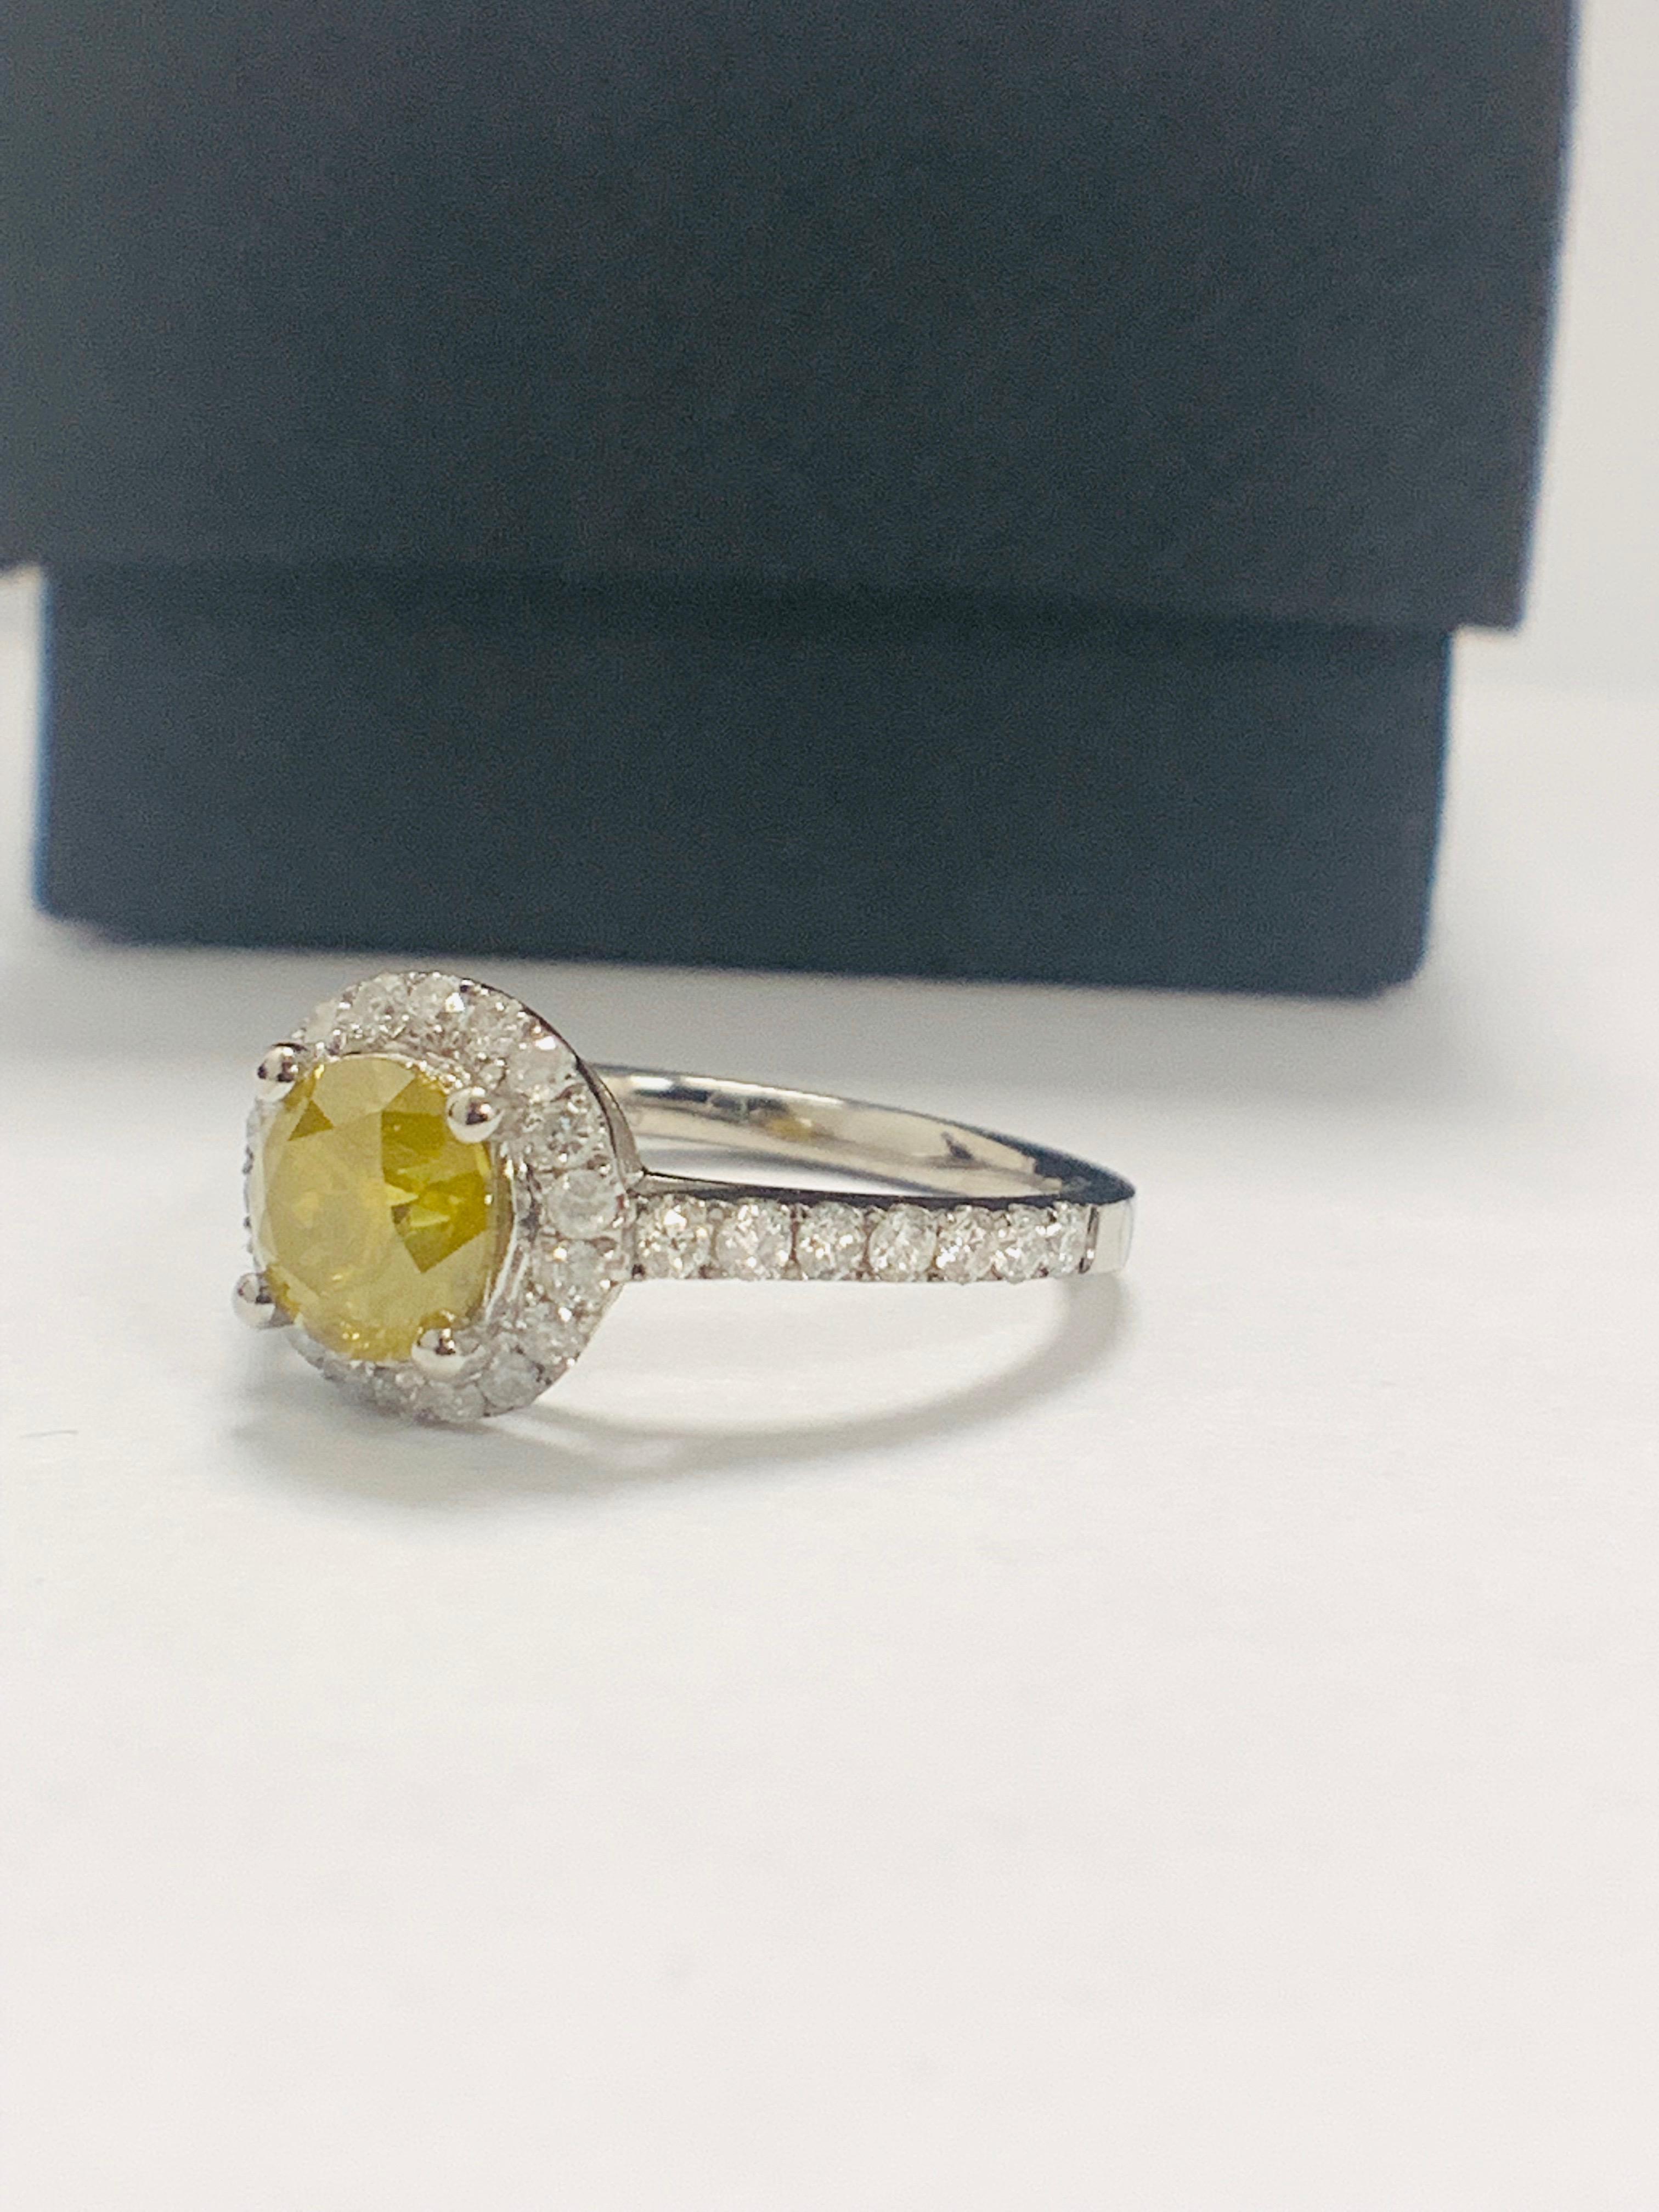 14ct White Gold Diamond ring featuring centre, round brilliant cut, yellow Diamond (1.08ct) - Image 2 of 12